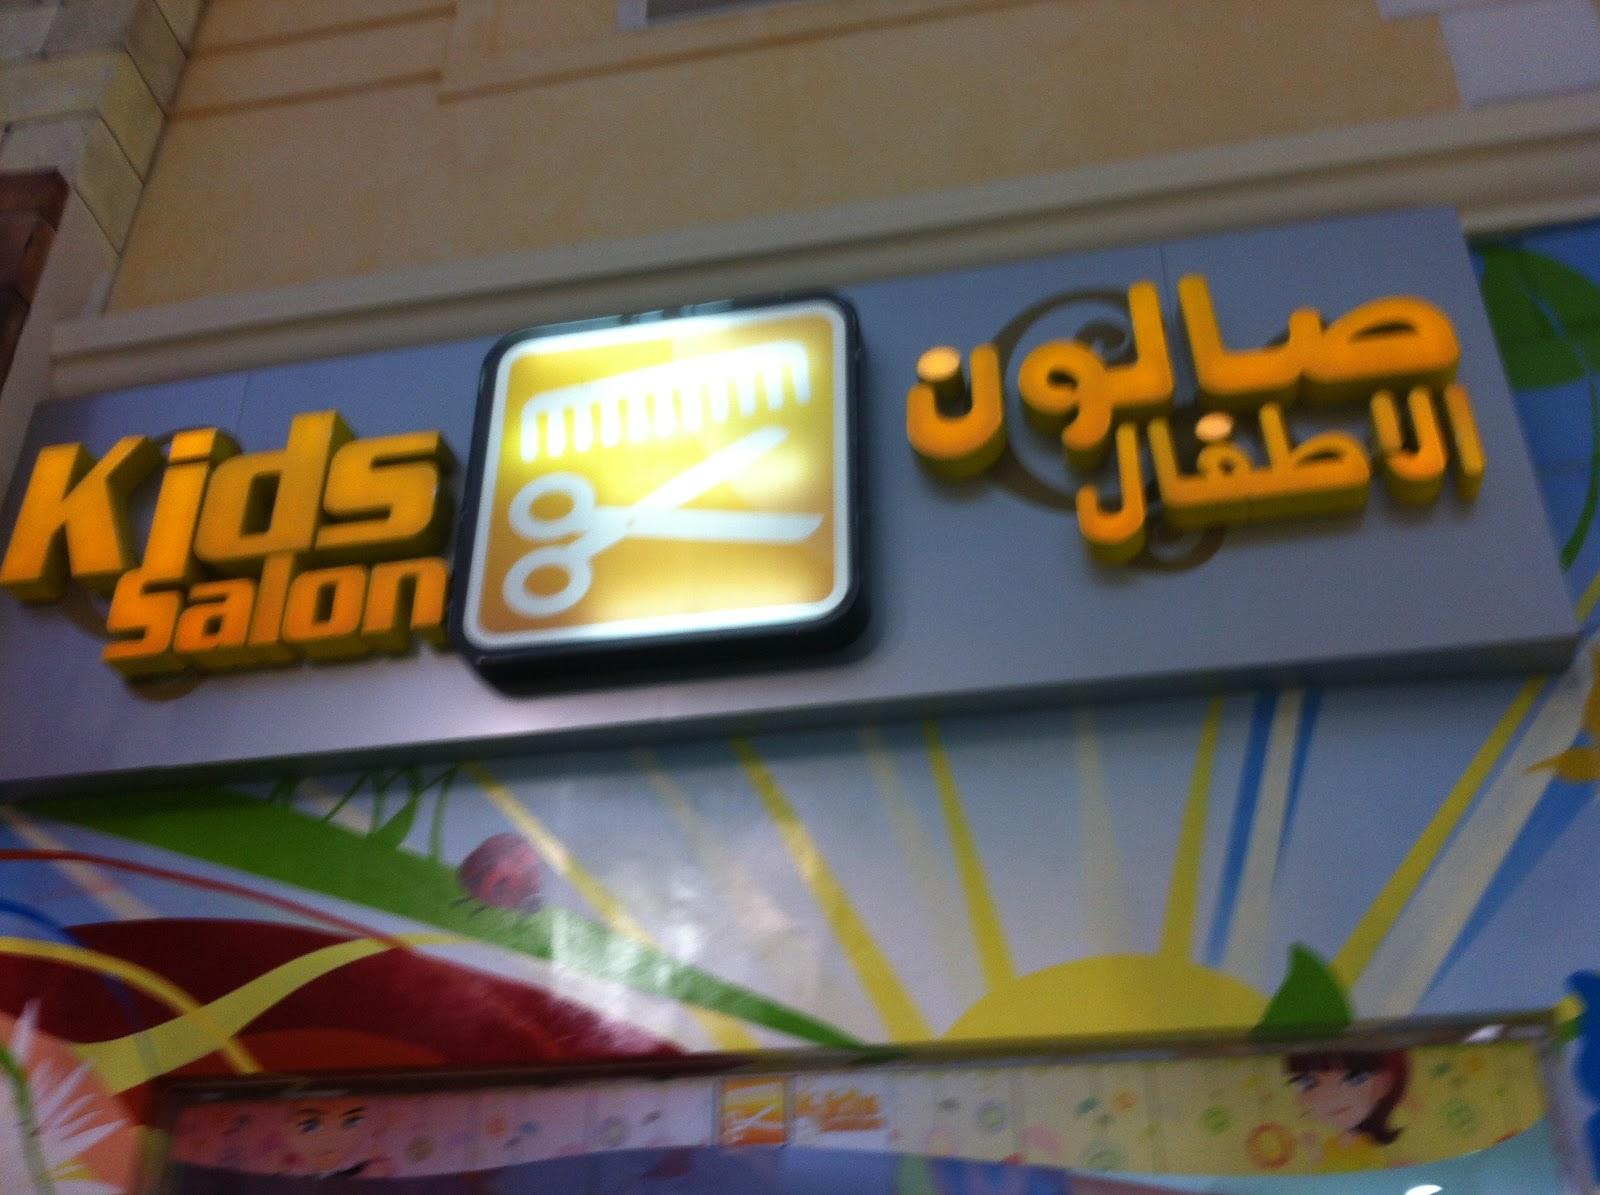 turknoy: kids salon in villagio mall - haircut for cute kids